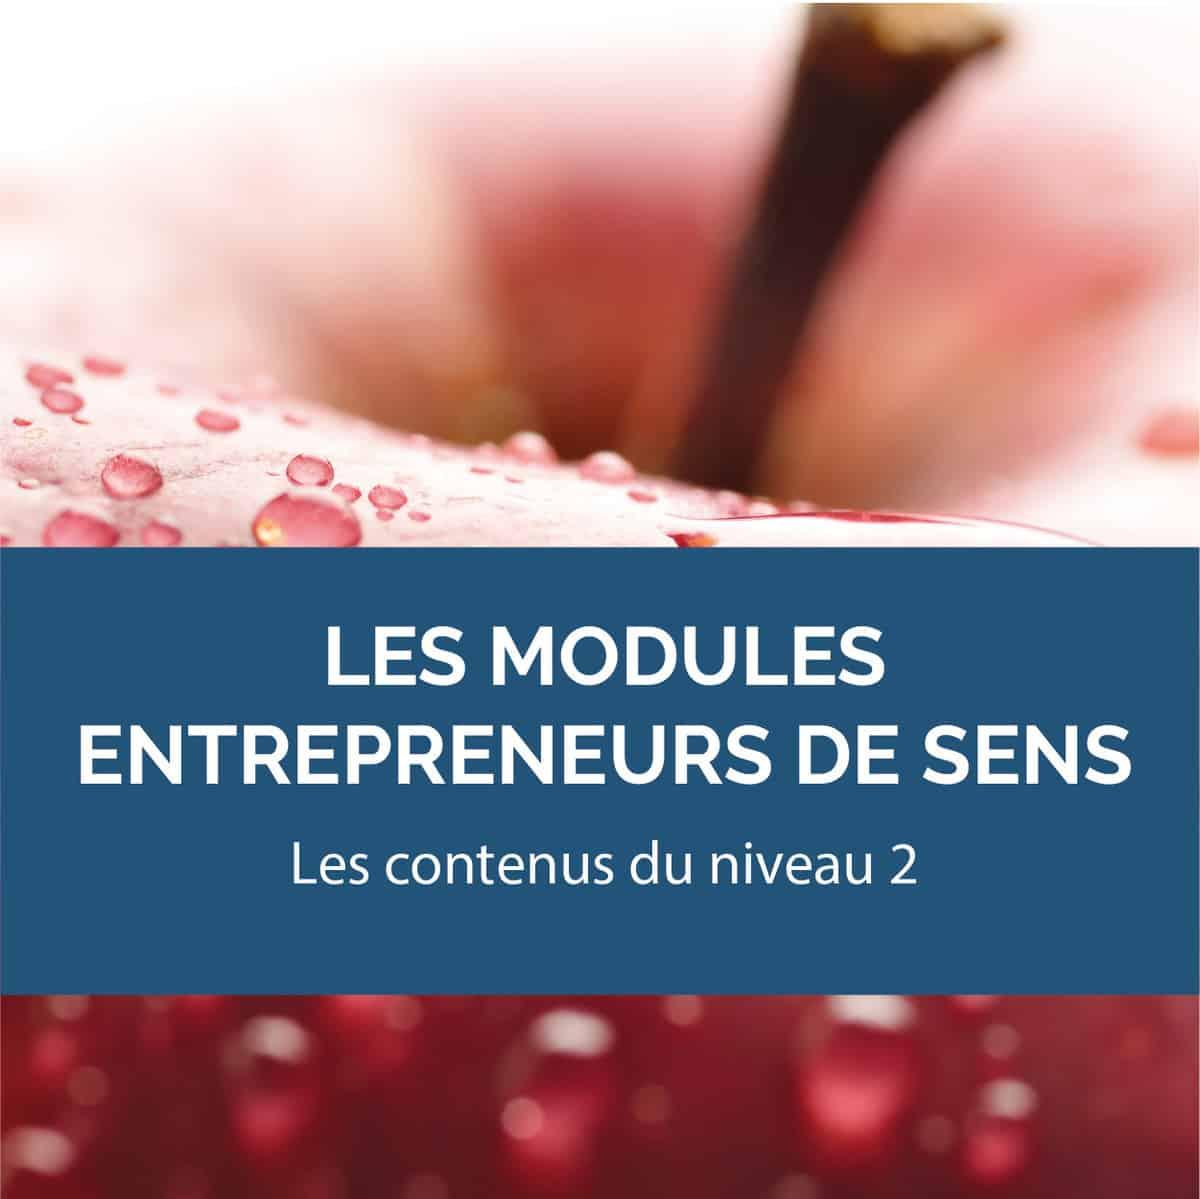 BCHOC3 Entrepreneurs